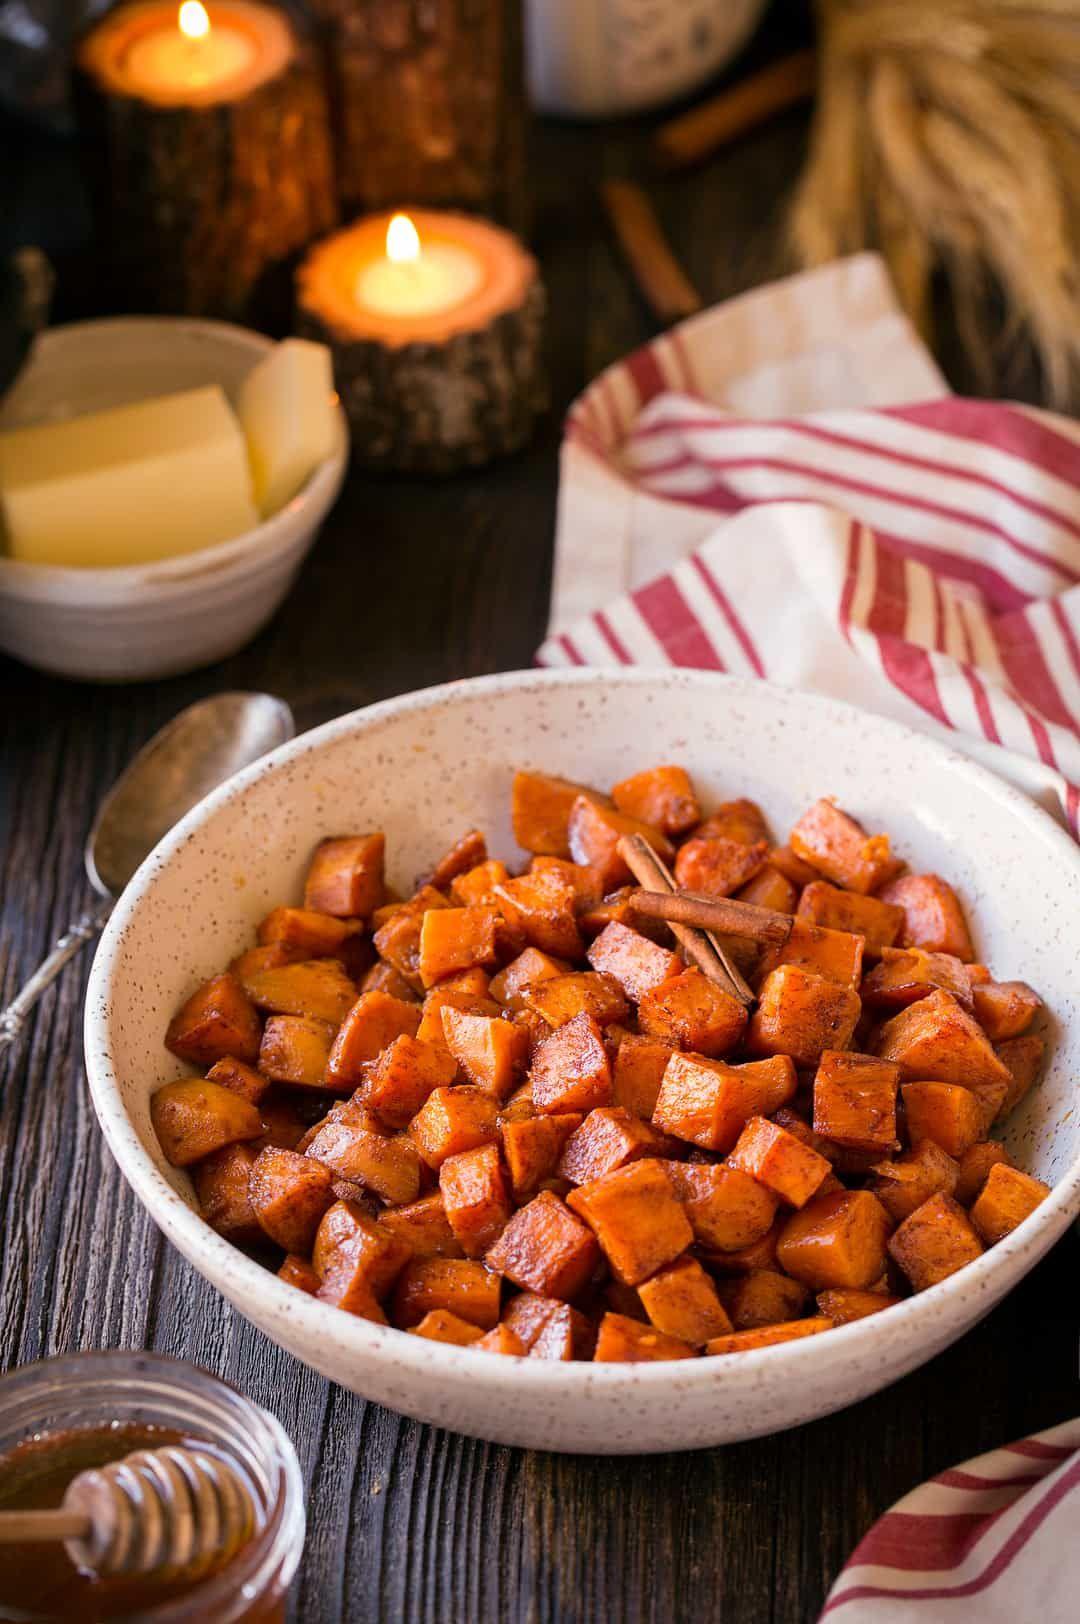 Cinnamon Honey Butter Roasted Sweet Potatoes